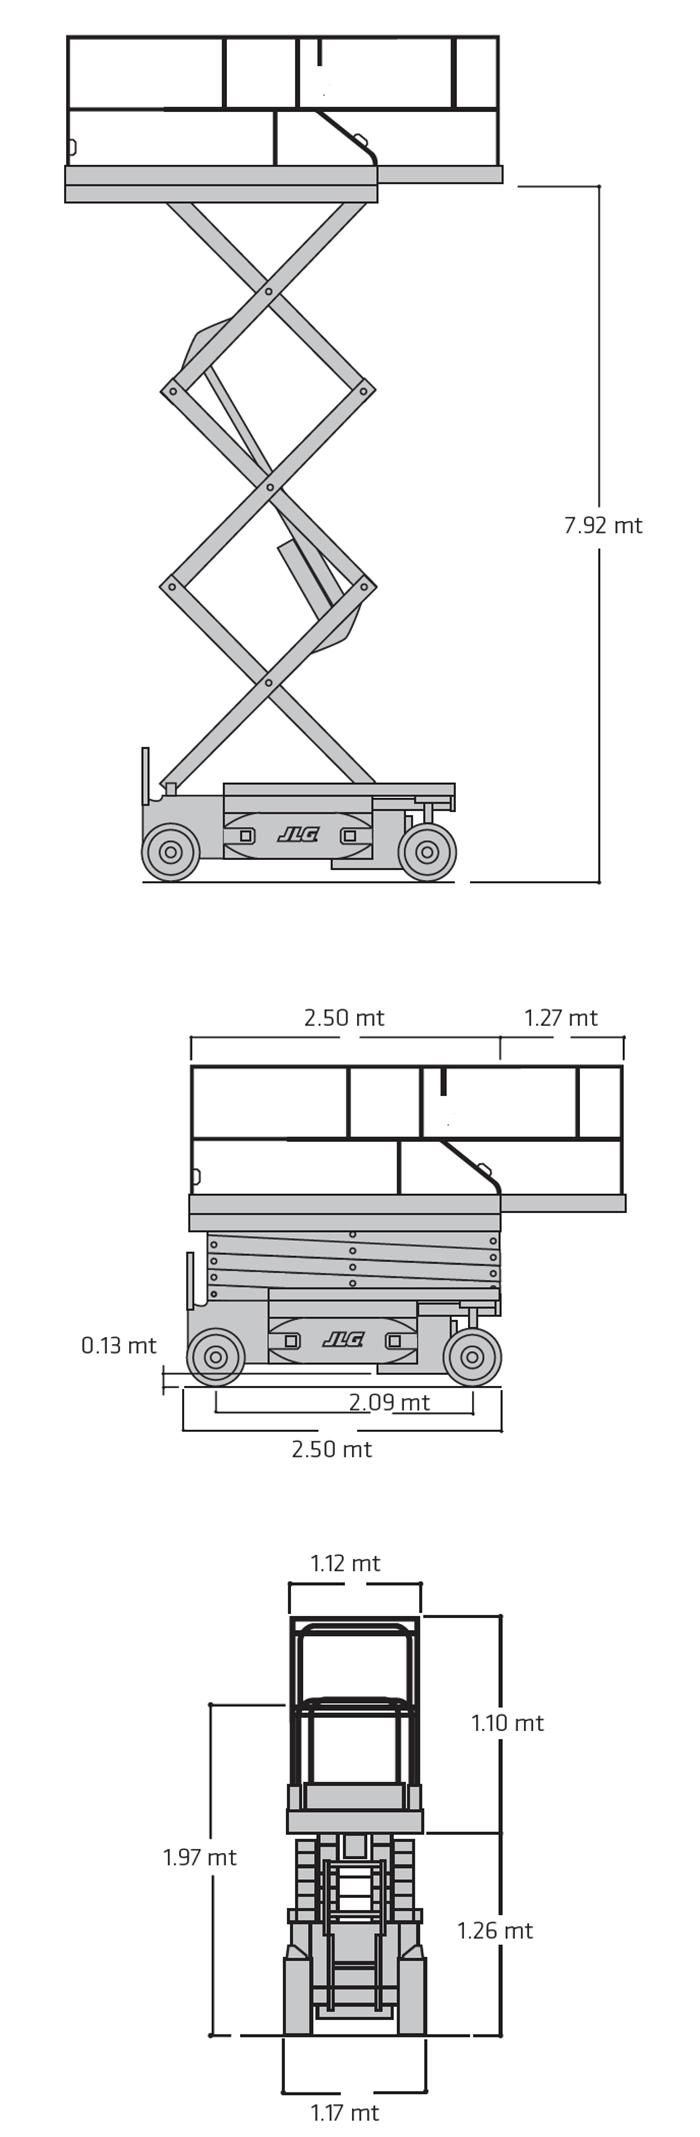 Piattaforma Semovente Verticale Elettrica VE 10 JL - 2646 ES